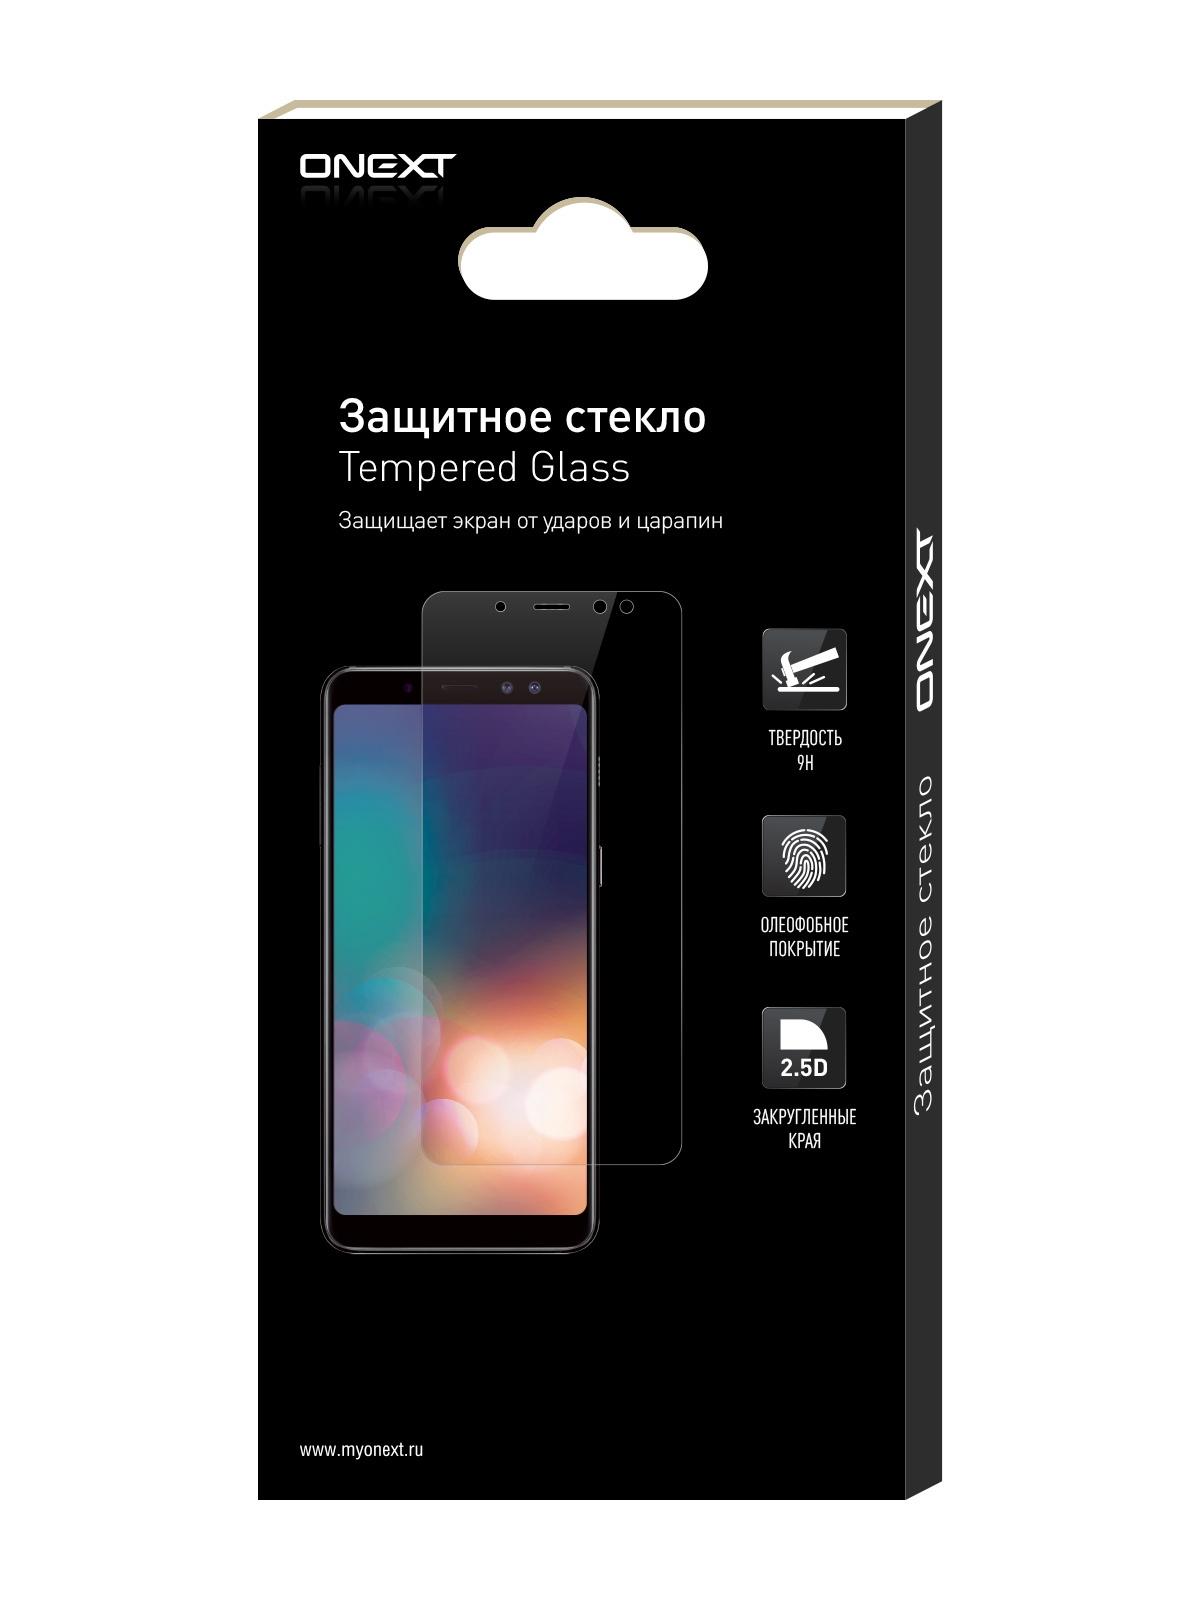 Защитное стекло ONEXT Asus Zenfone Go ZB500KL/ZB500KG цены онлайн